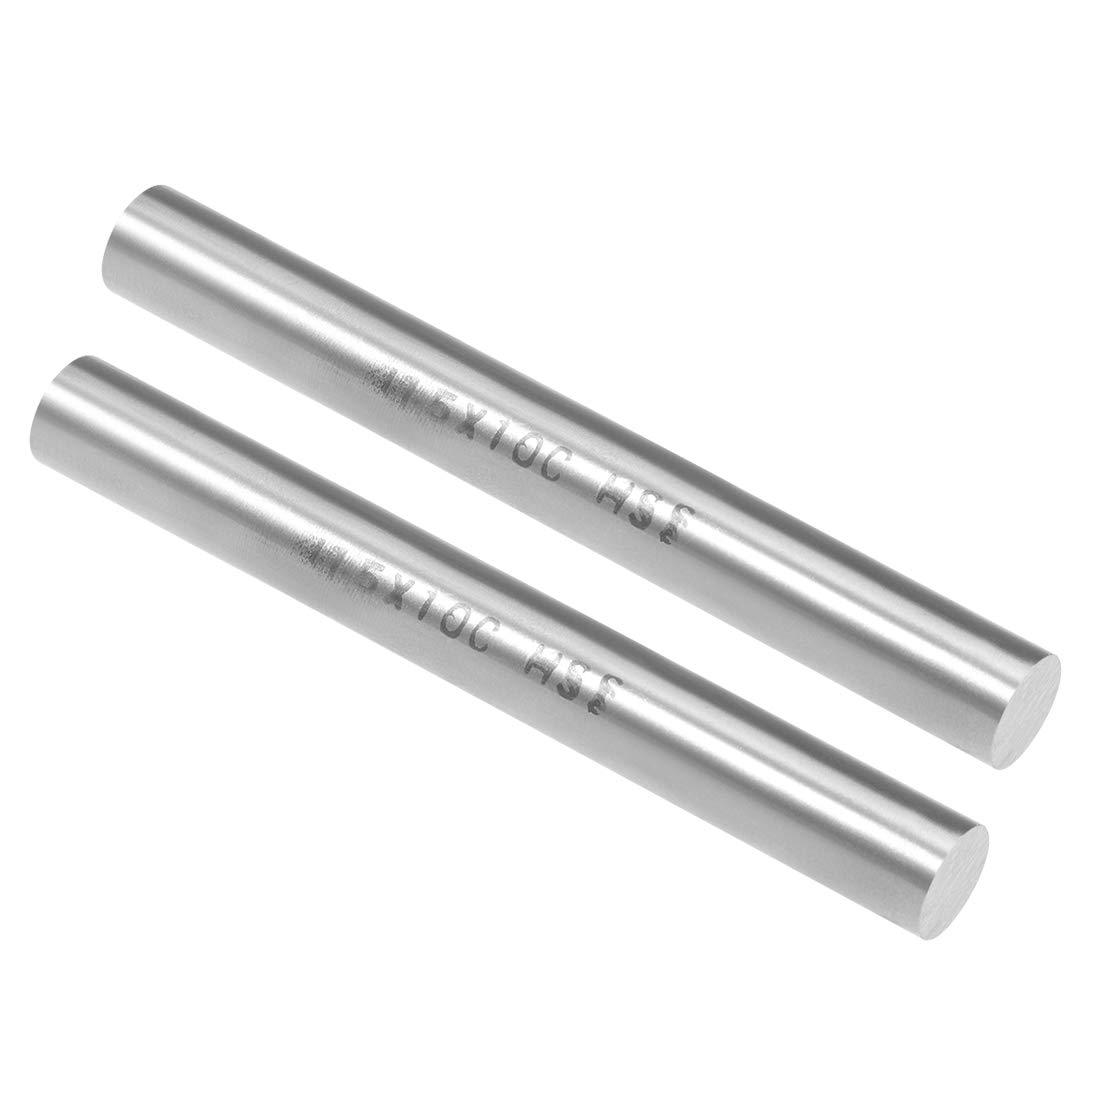 uxcell HSS Lathe Round Rod Solid Shaft Bar 7mm Dia 100mm Length 5Pcs